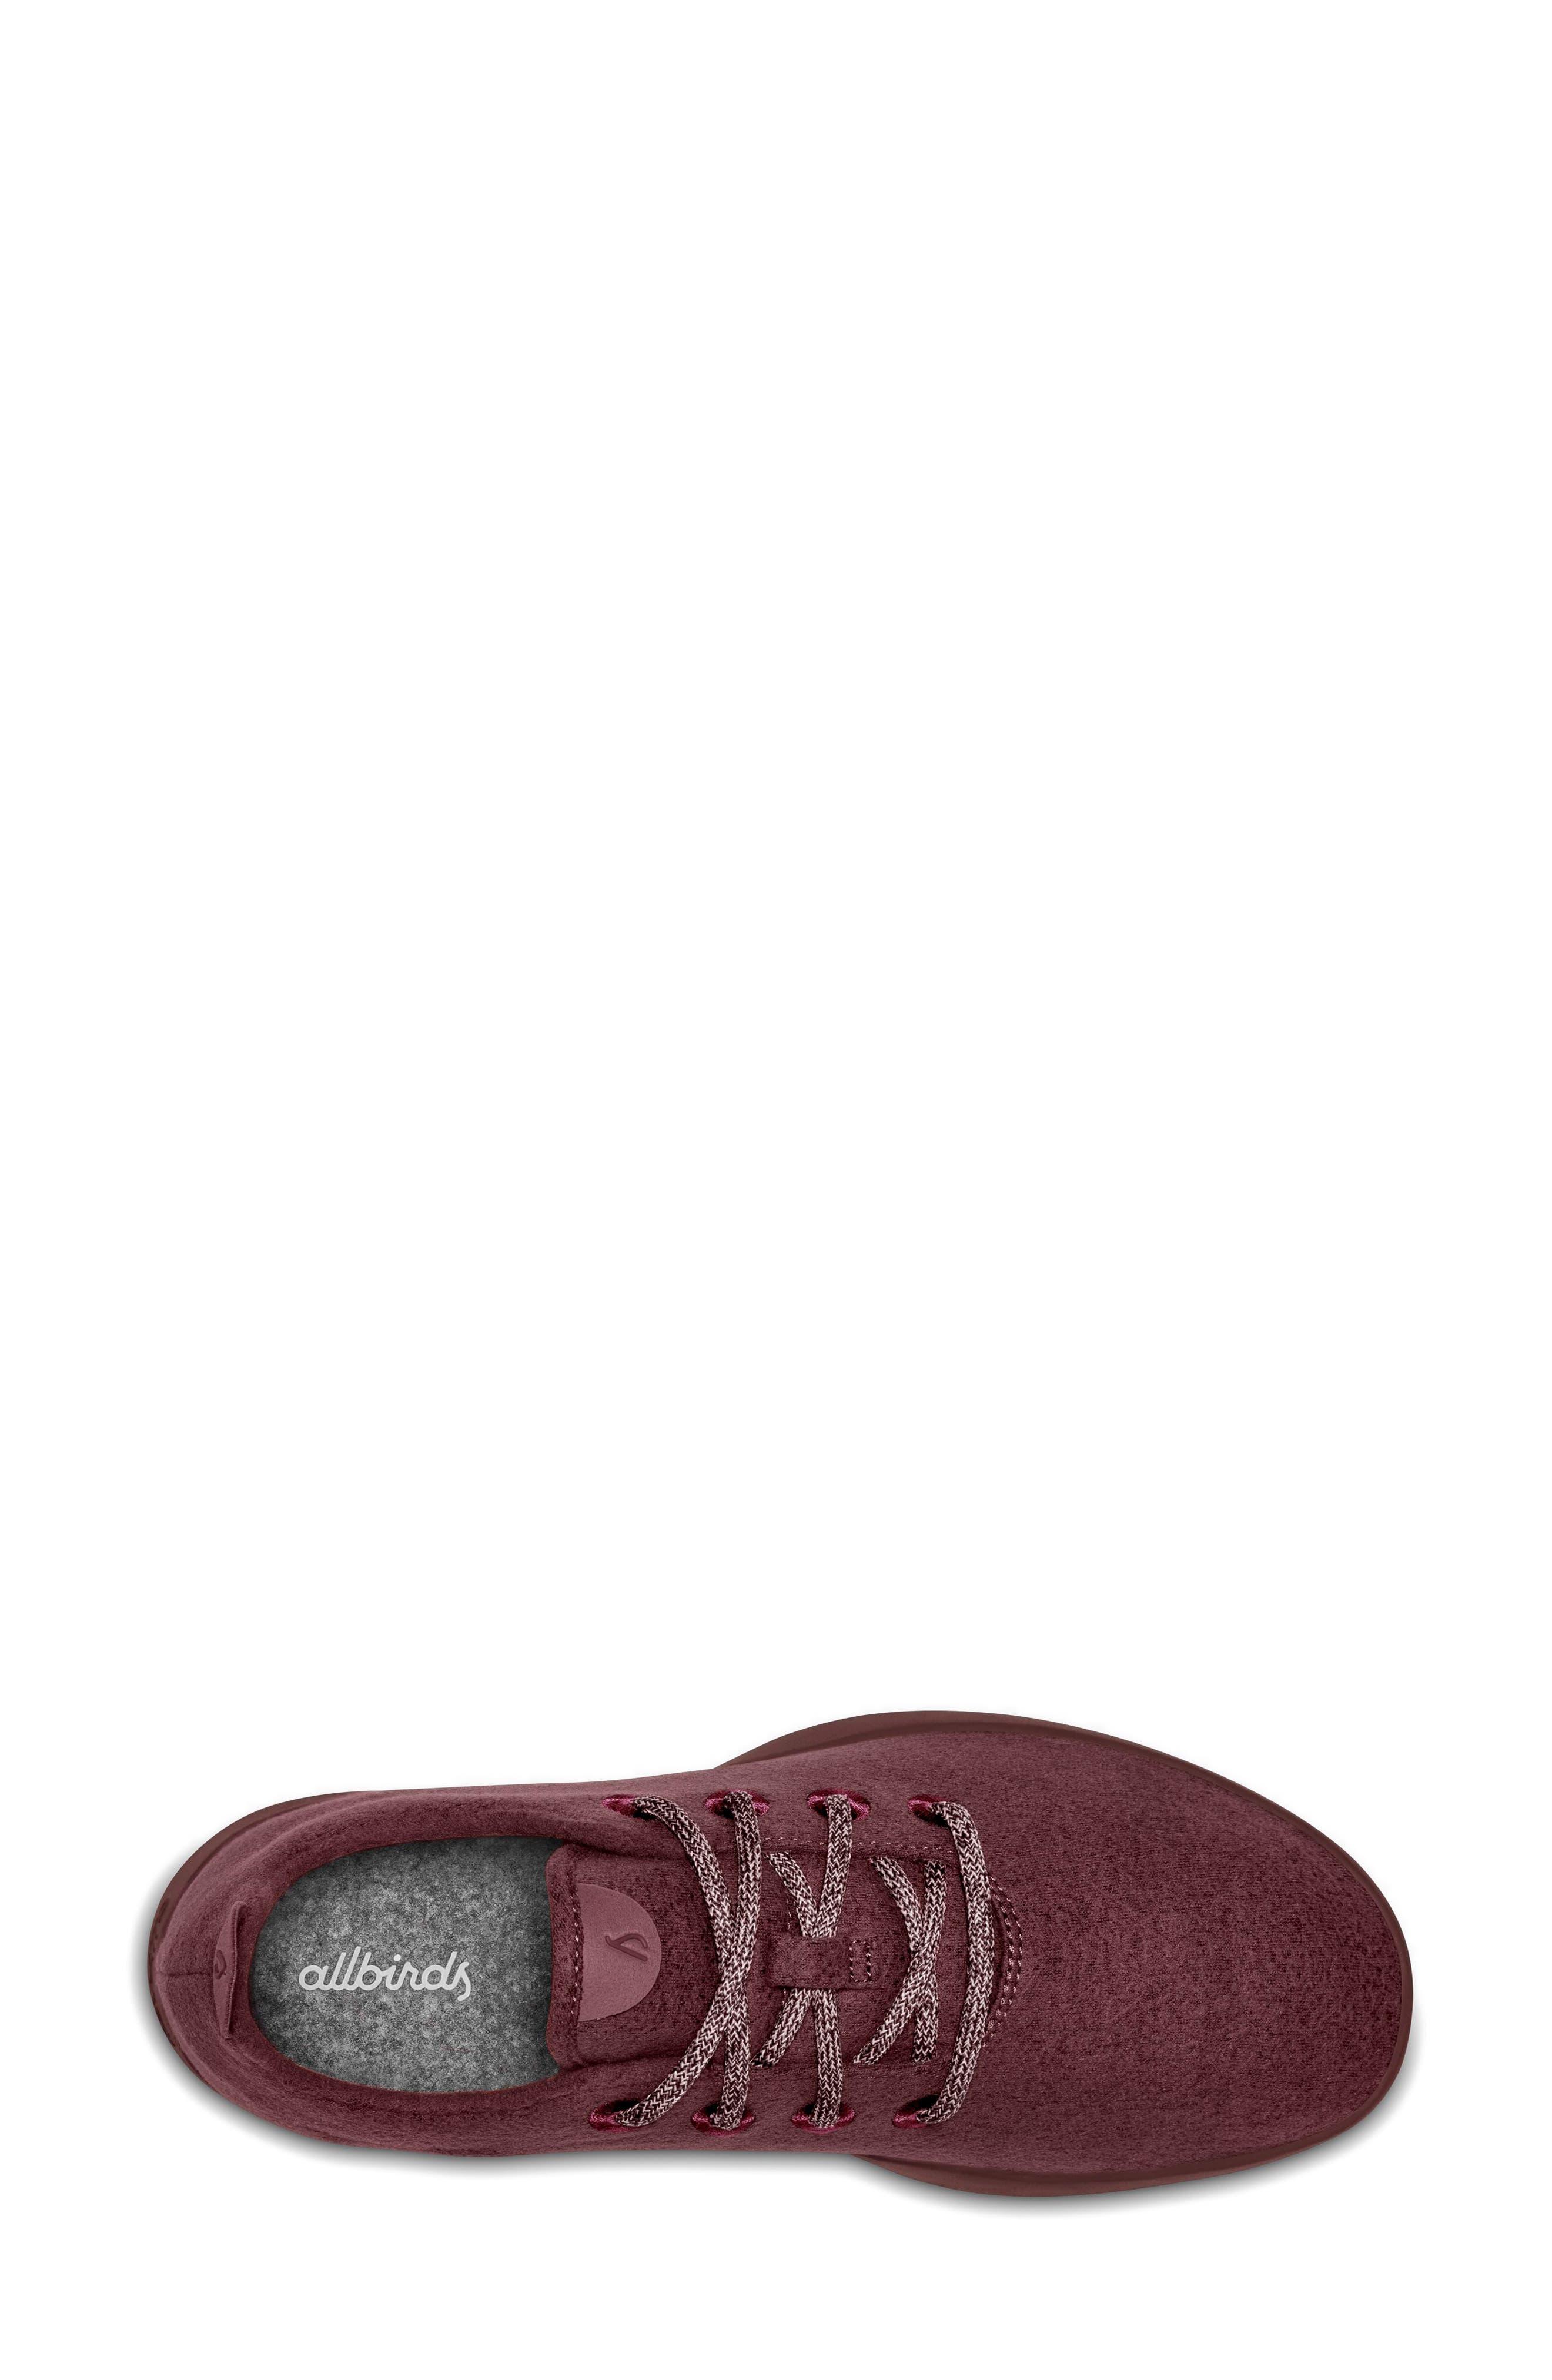 Allbirds   Wool Runner Sneaker